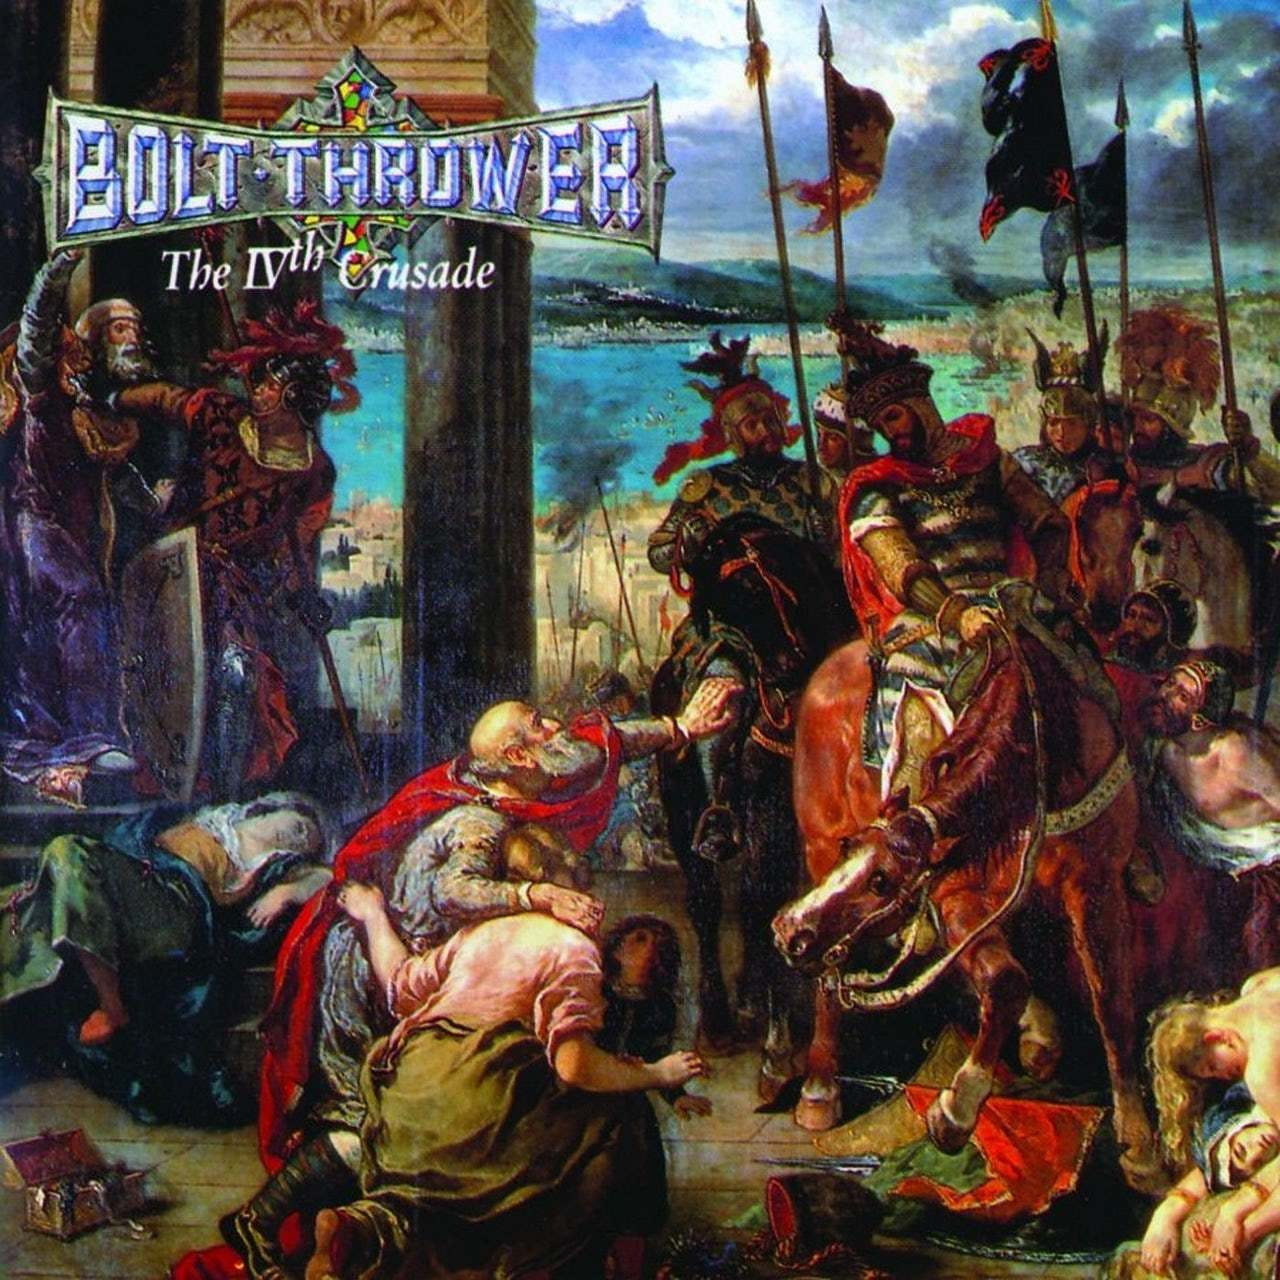 Bolt Thrower Ivth Crusade